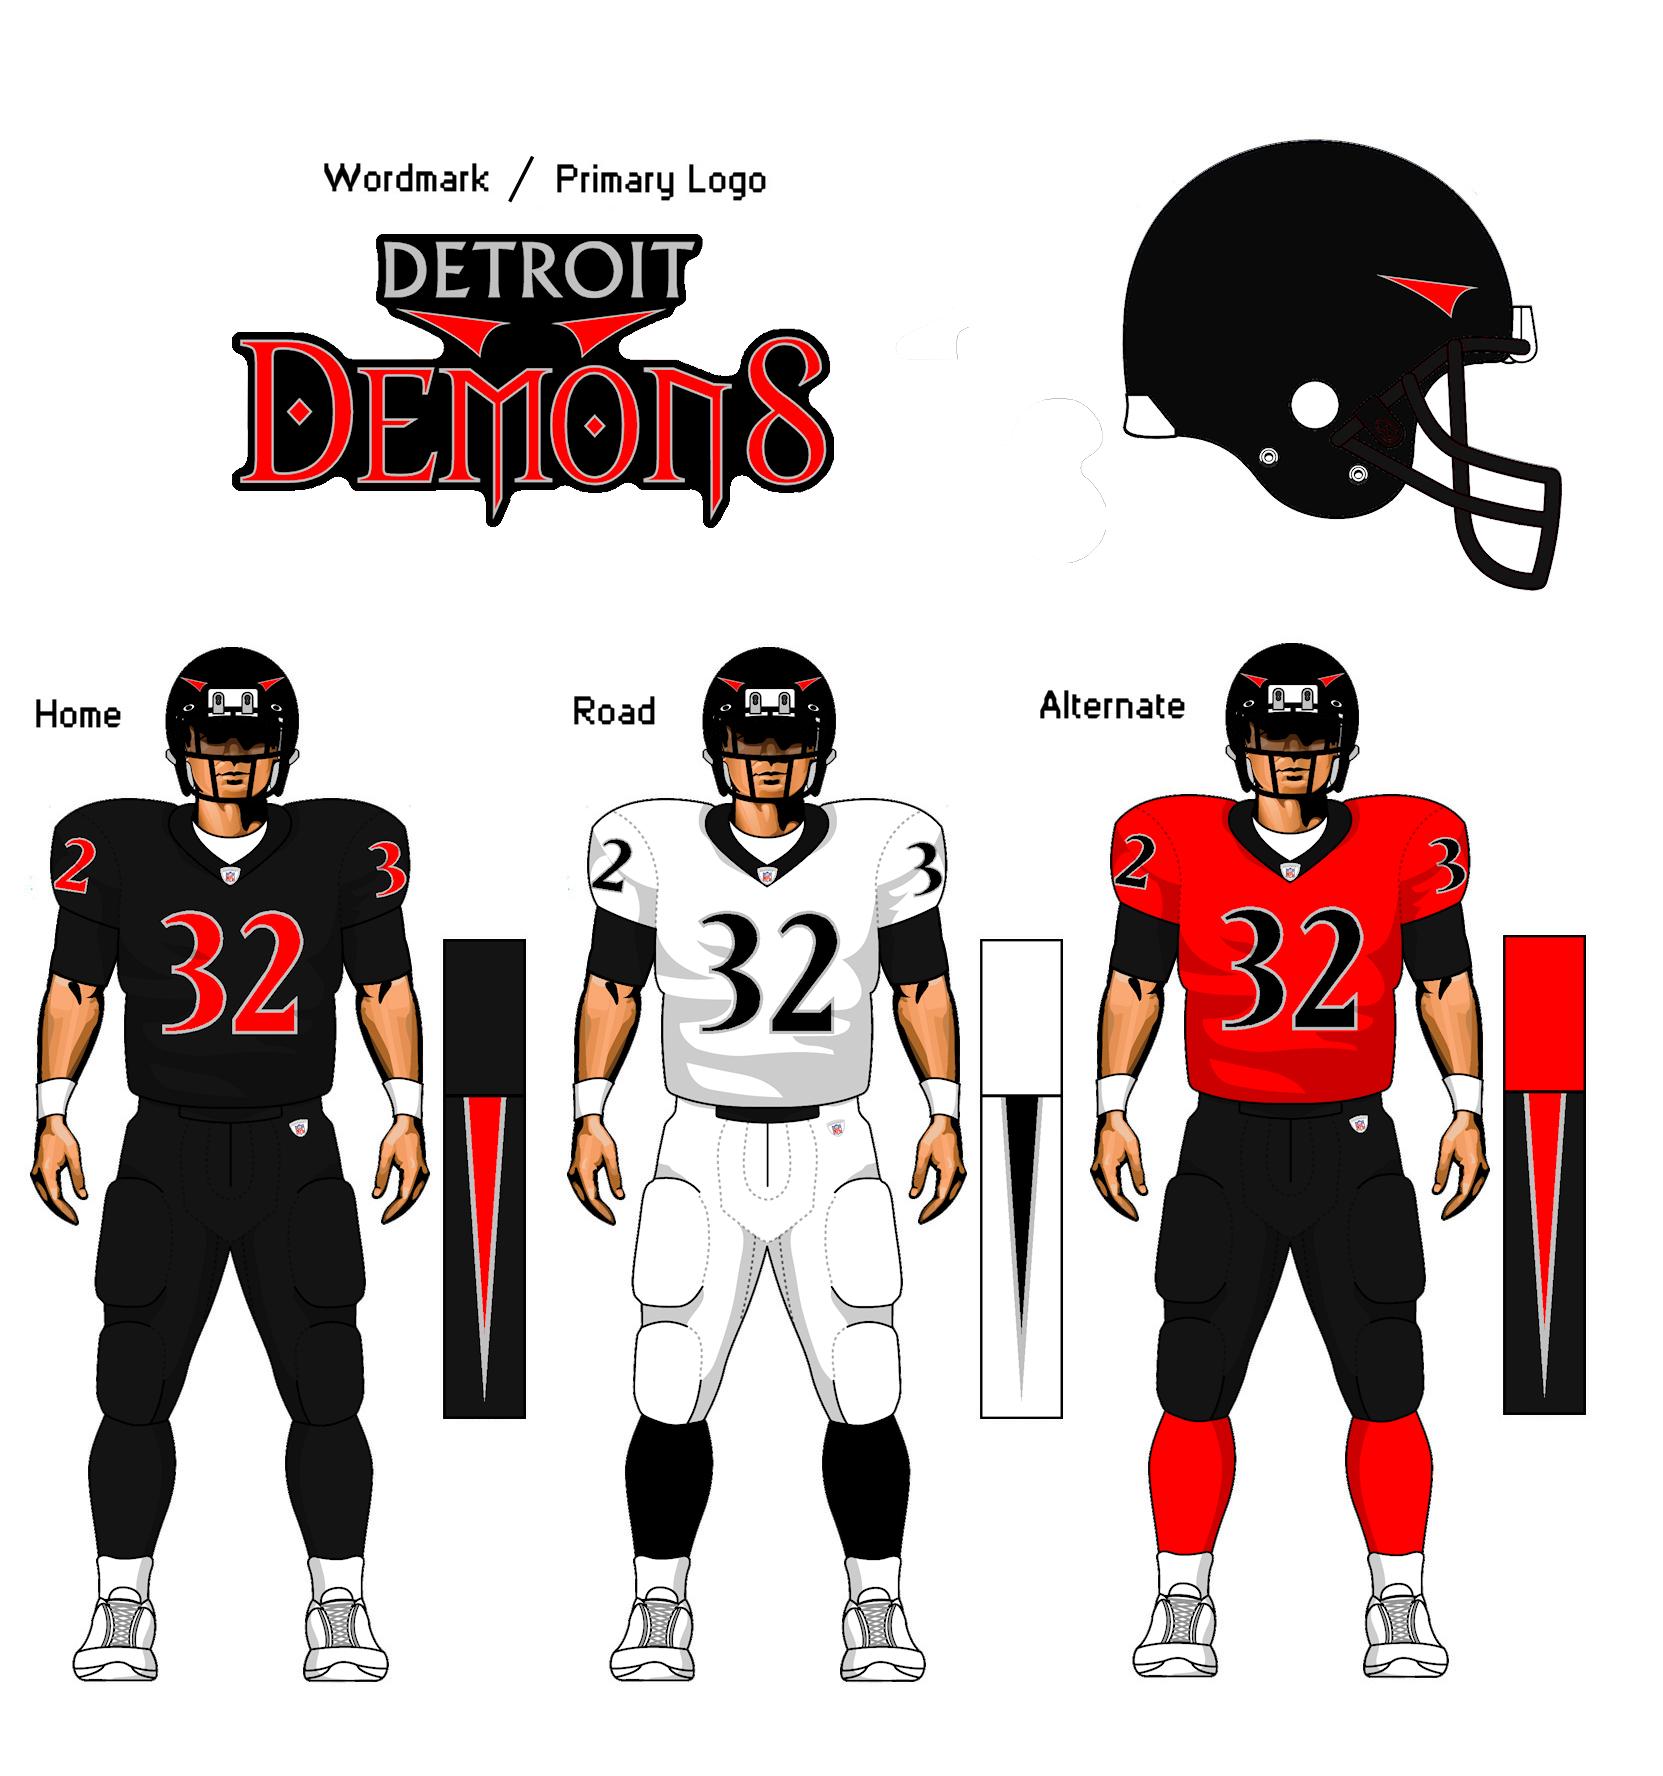 Detroitdemonsfantasyfootballteambythegreatktulu Dzbdo